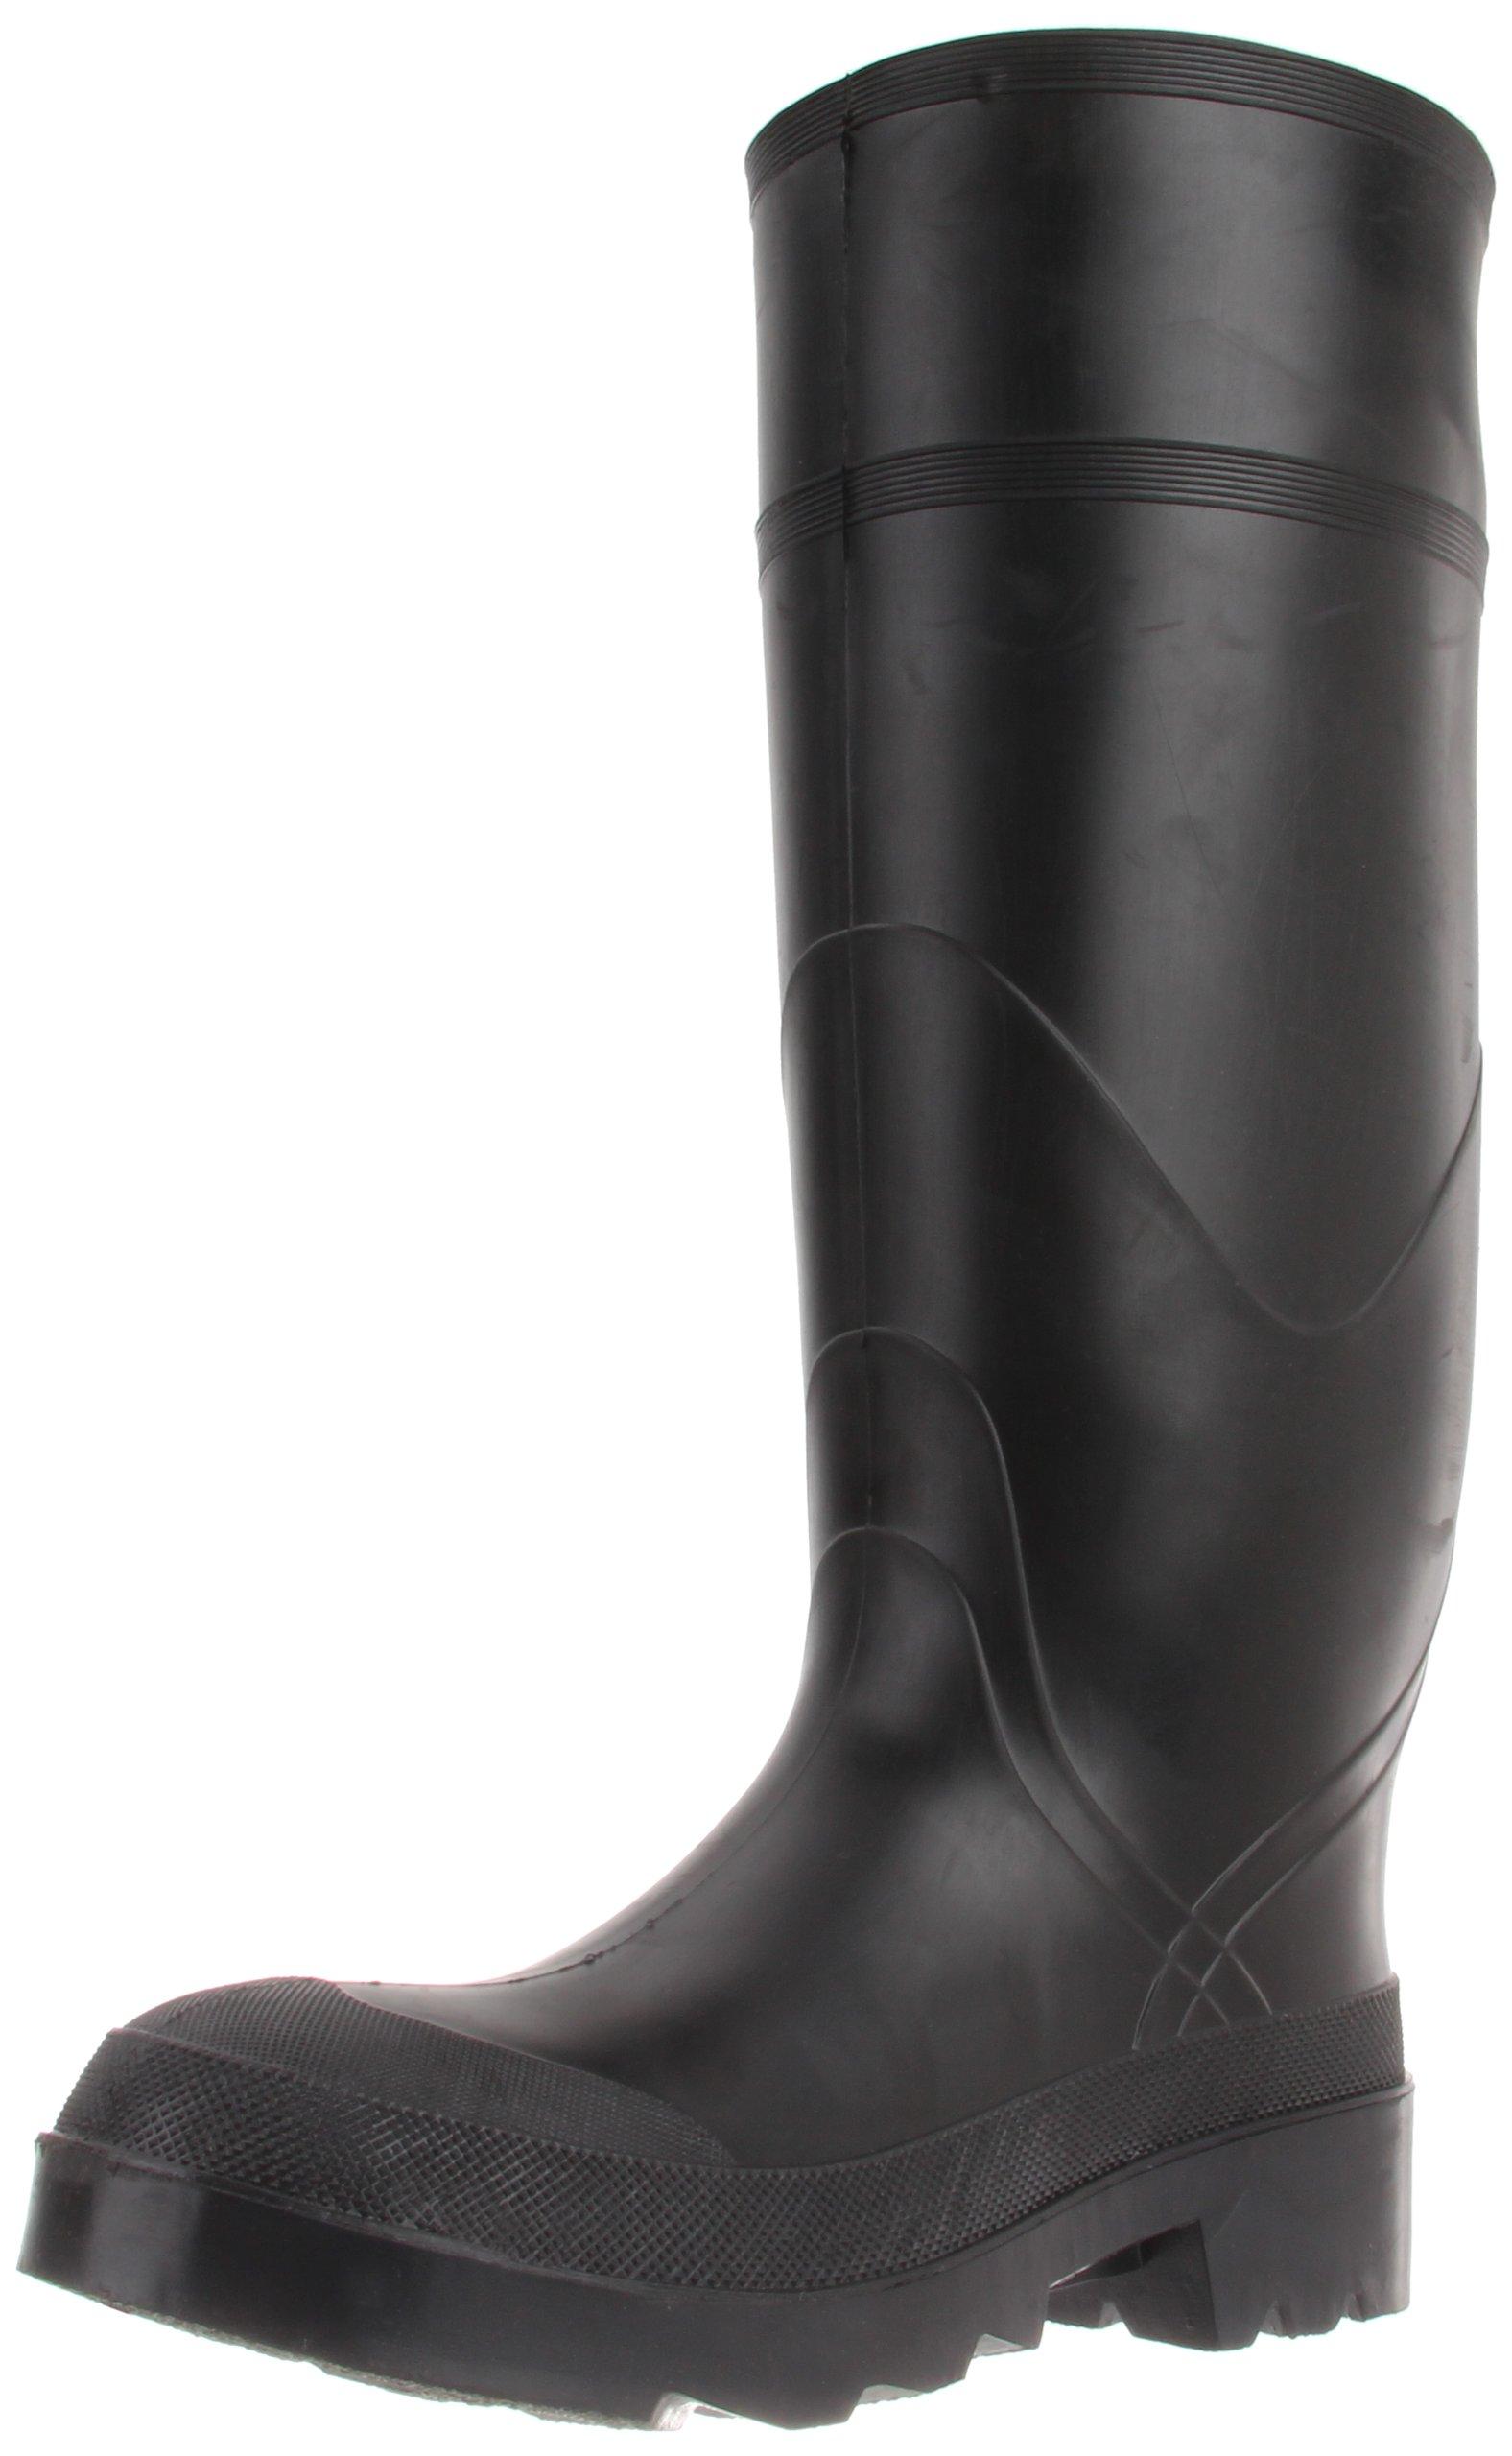 Baffin Men's Express 15'' Rain Boot,Black,6 M US